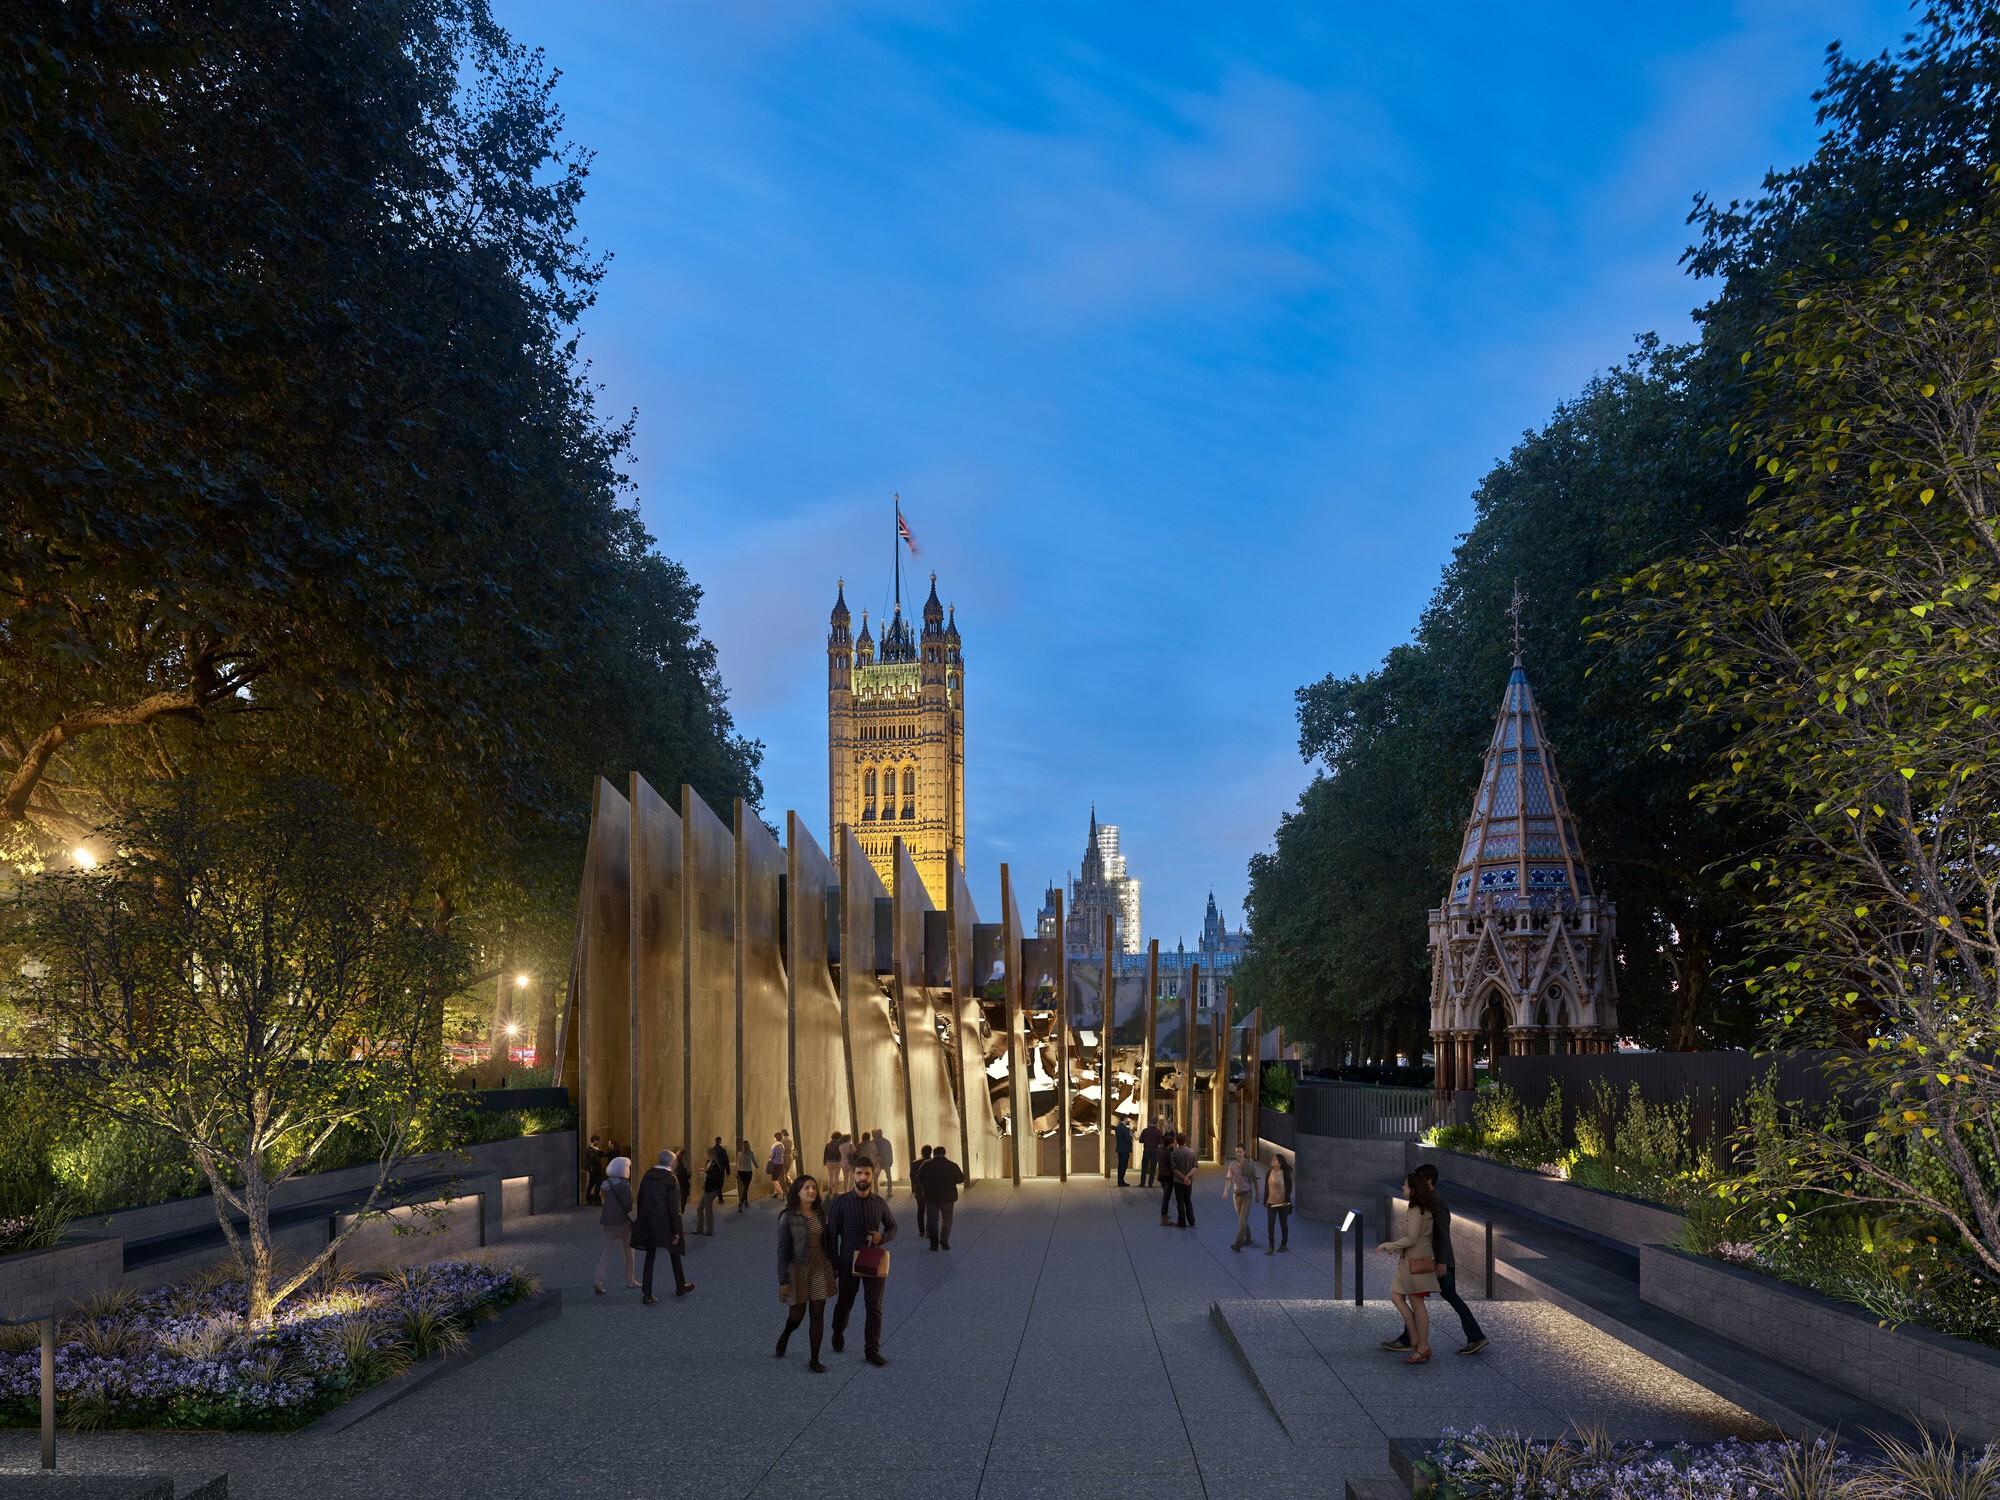 David Adjaye's Holocaust Memorial in London Receives Approval